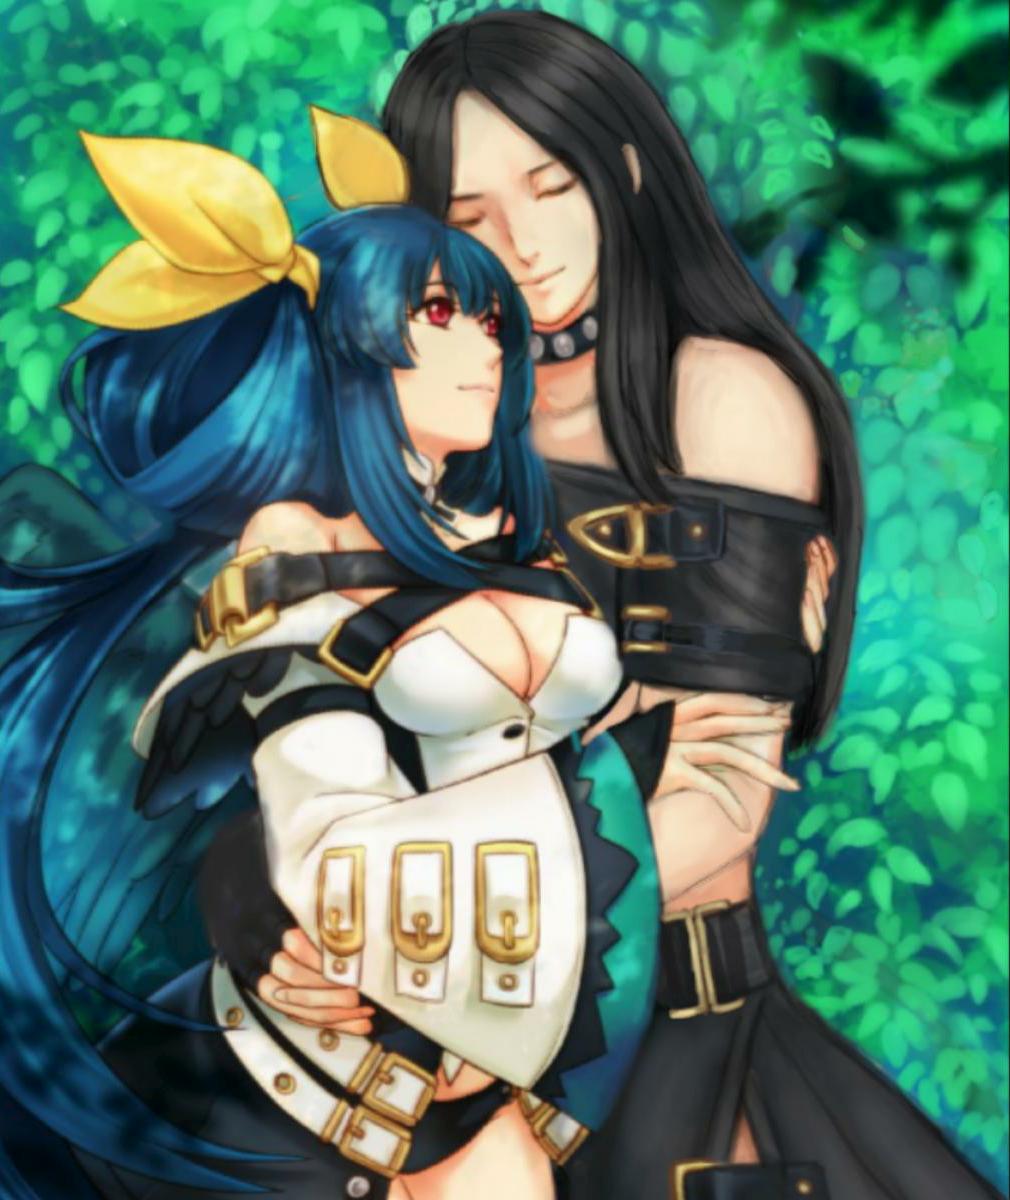 black_hair blue_hair couple dizzy_(guilty_gear) guilty_gear guilty_gear_xrd guilty_gear_xx happy hug red_eyes testament_(guilty_gear) wings